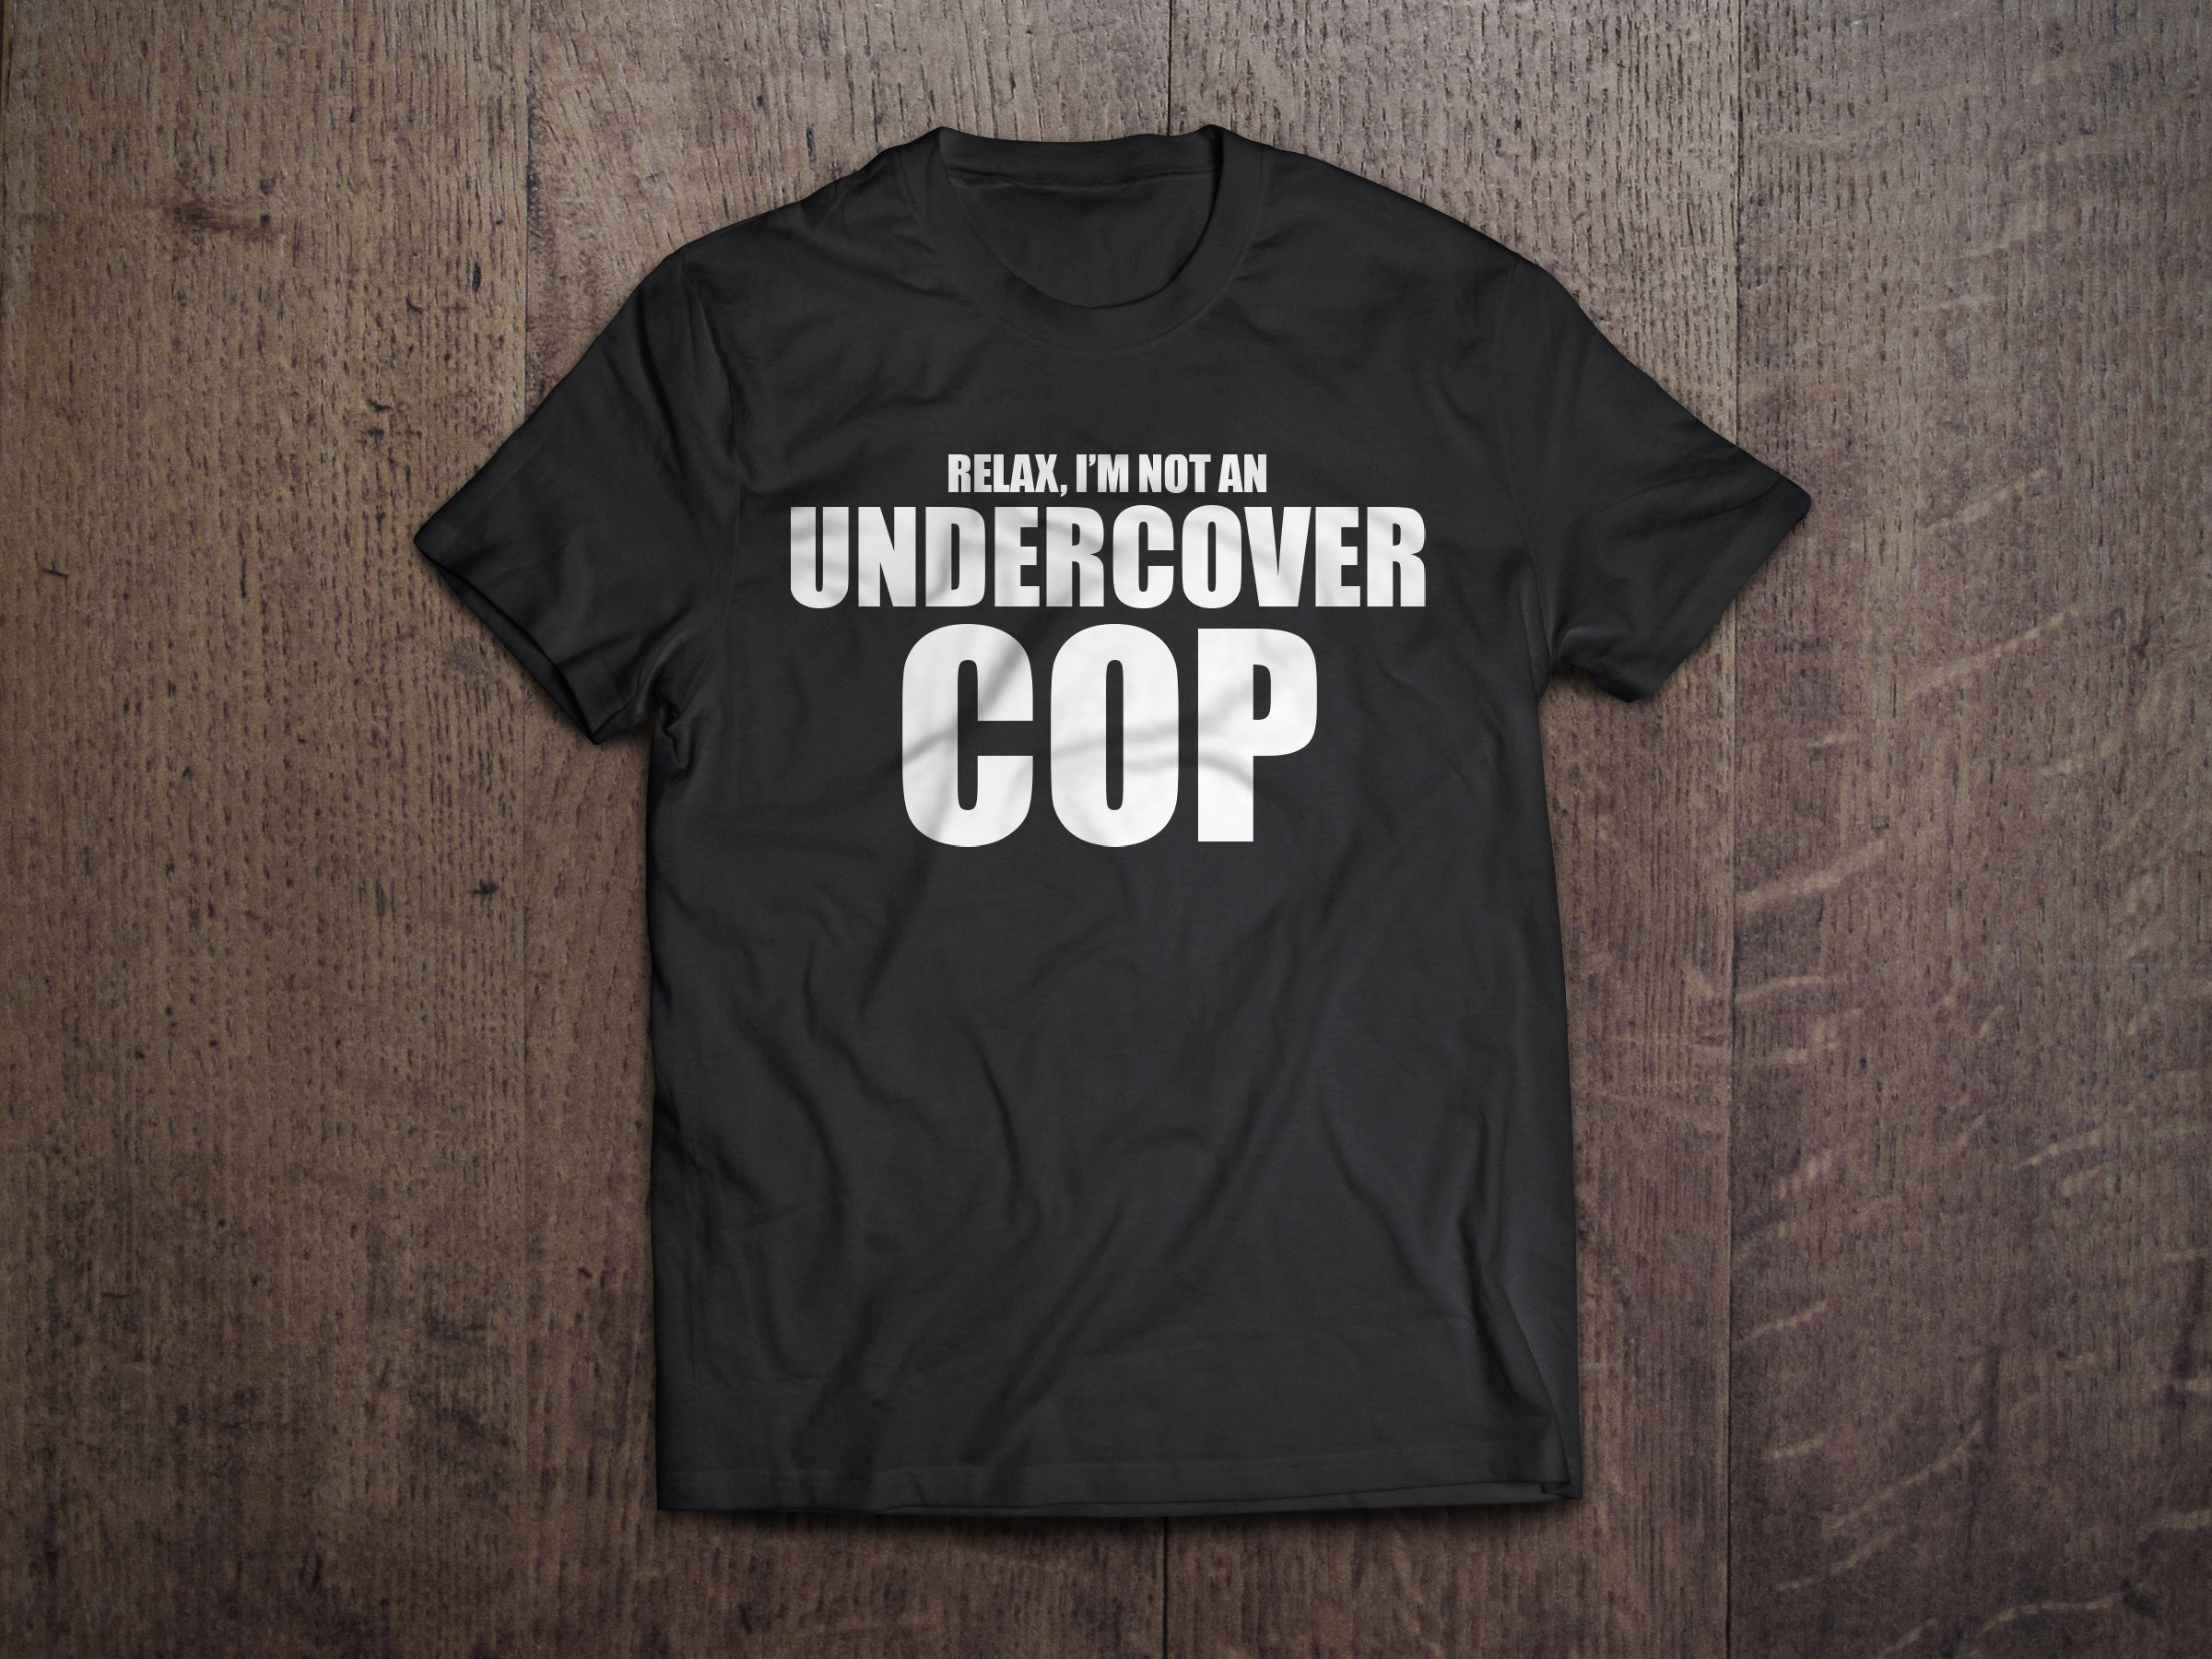 Relax, I'm Not an Undercover Cop